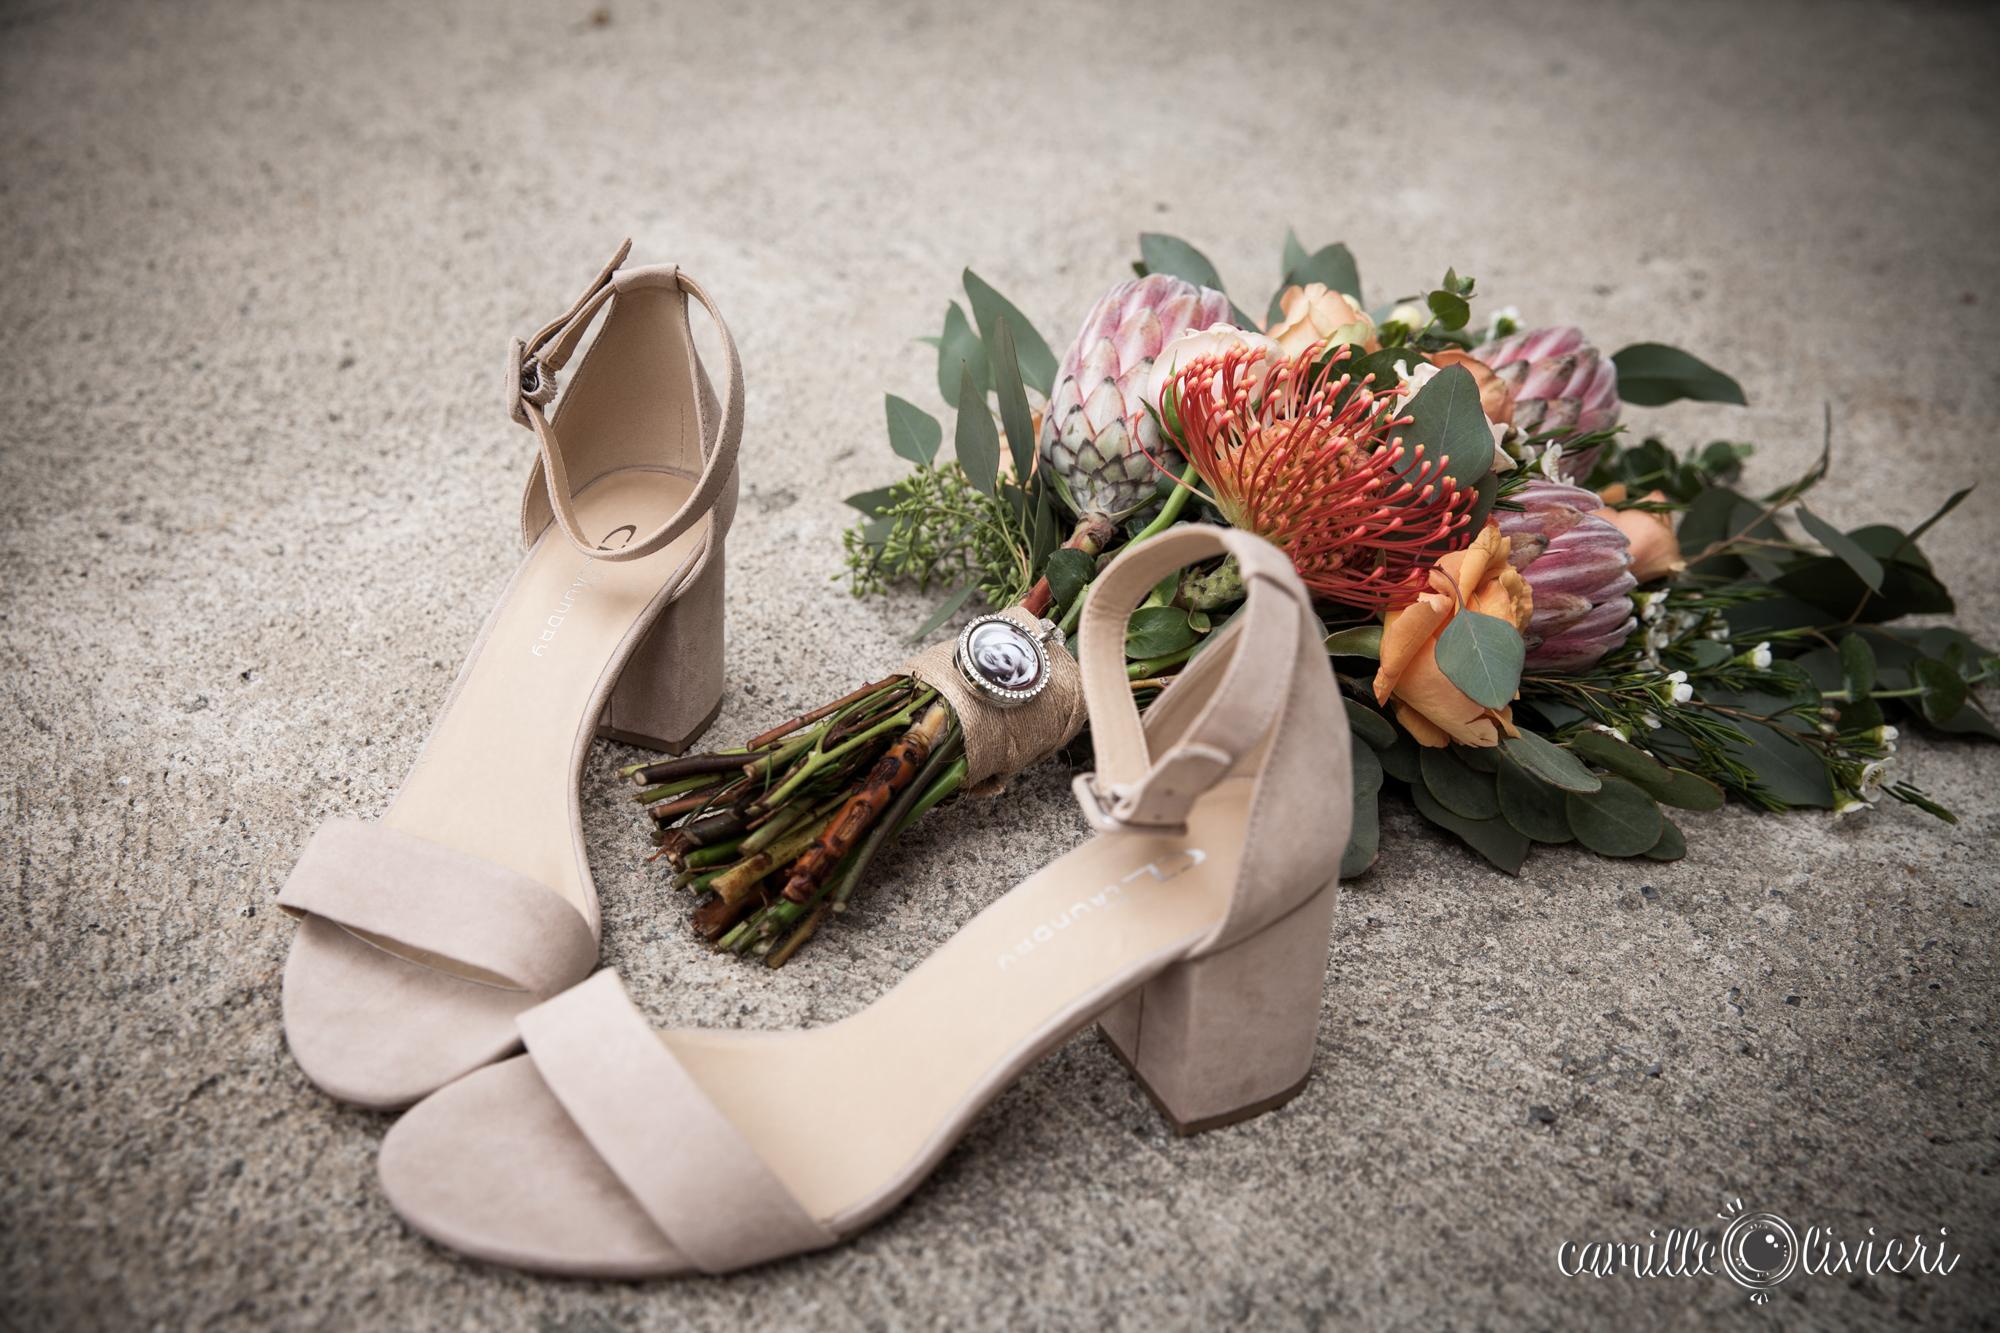 photographe_grenoble_mariage-camille-olivieri-12